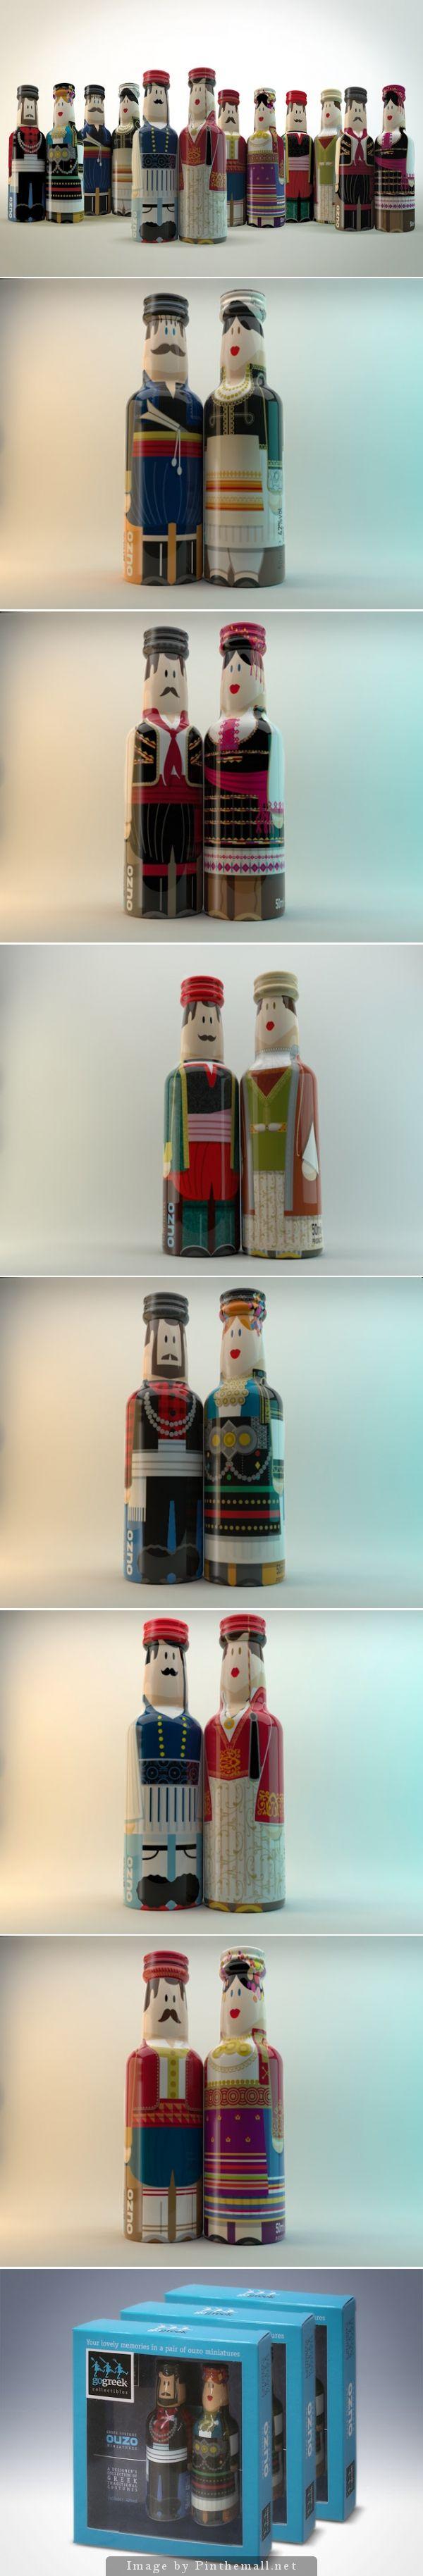 Gogreek Ouzo Miniatures